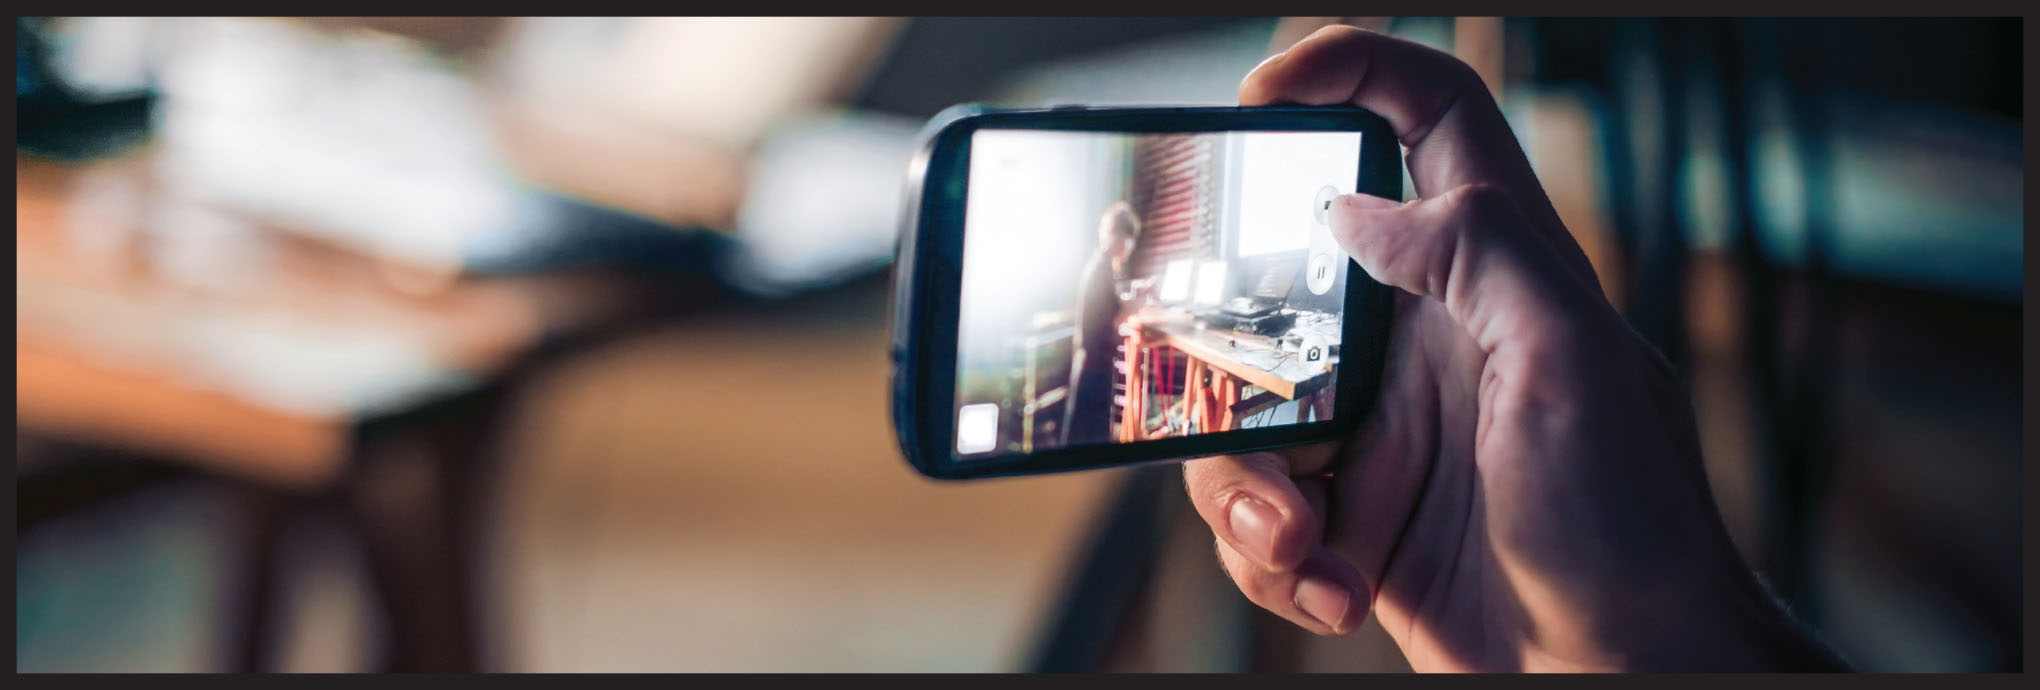 Women's Marketing - Mobile Video Marketing